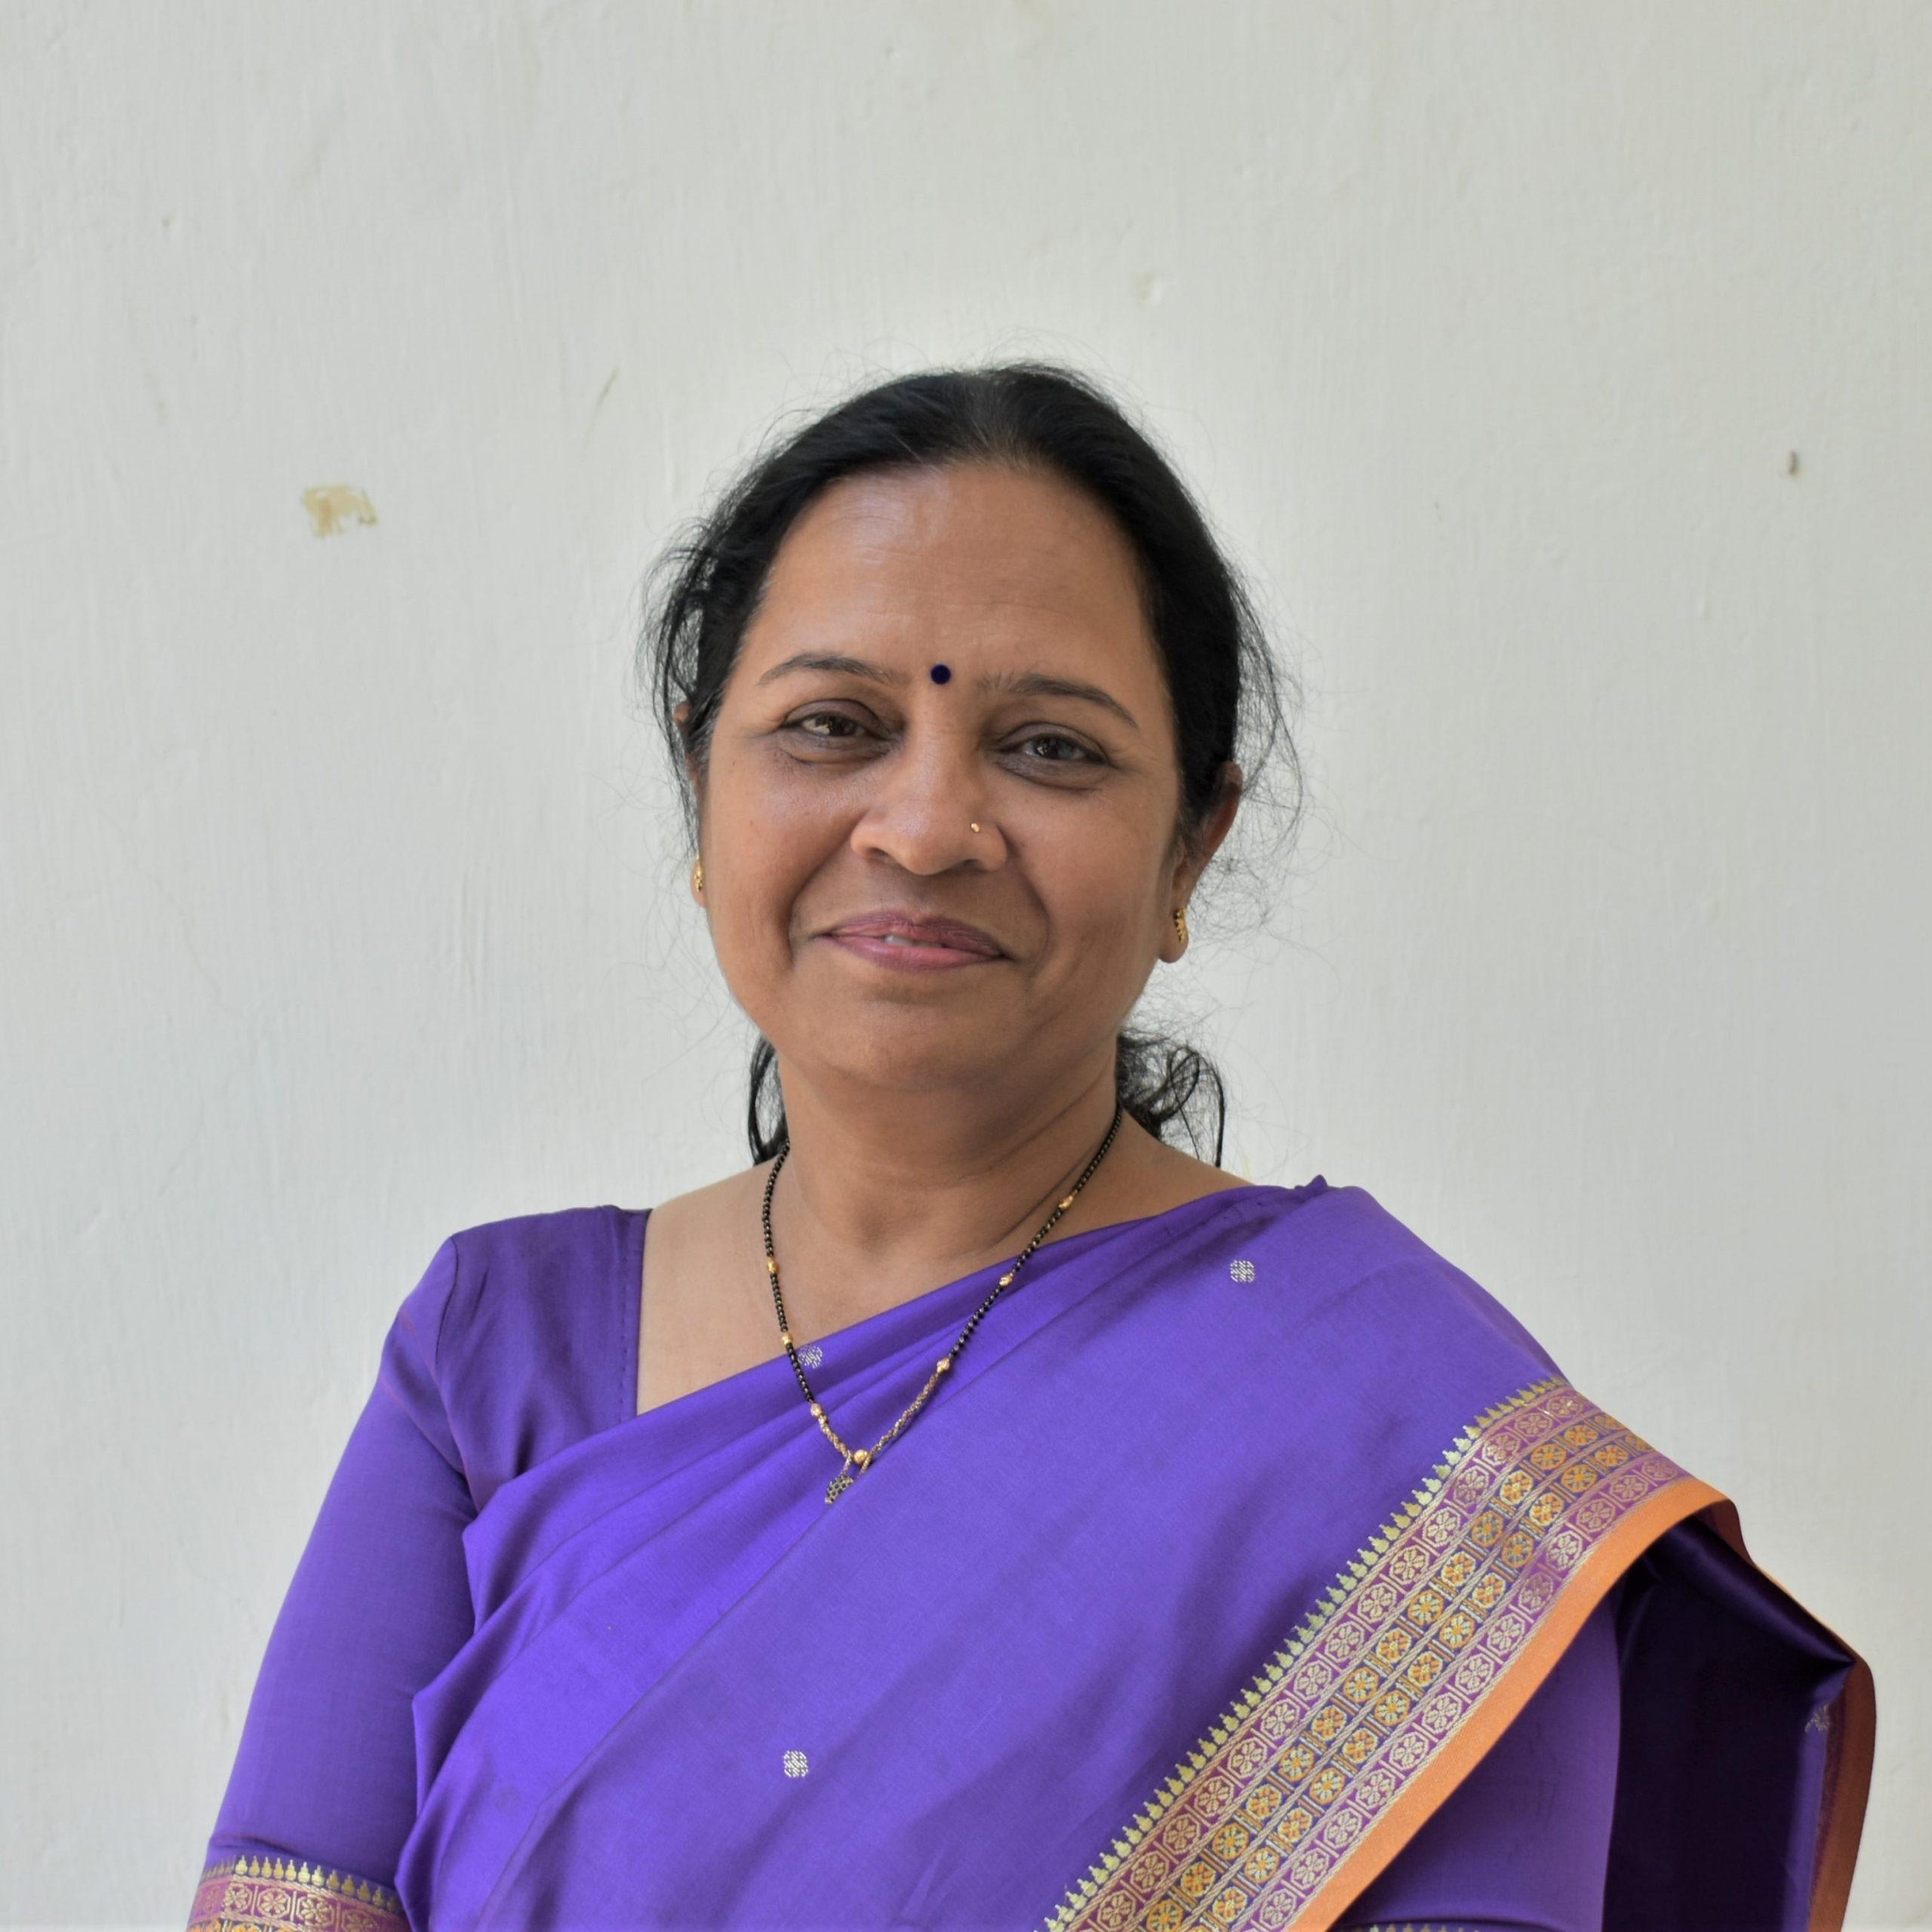 Dr. Neeta S. Tripathi